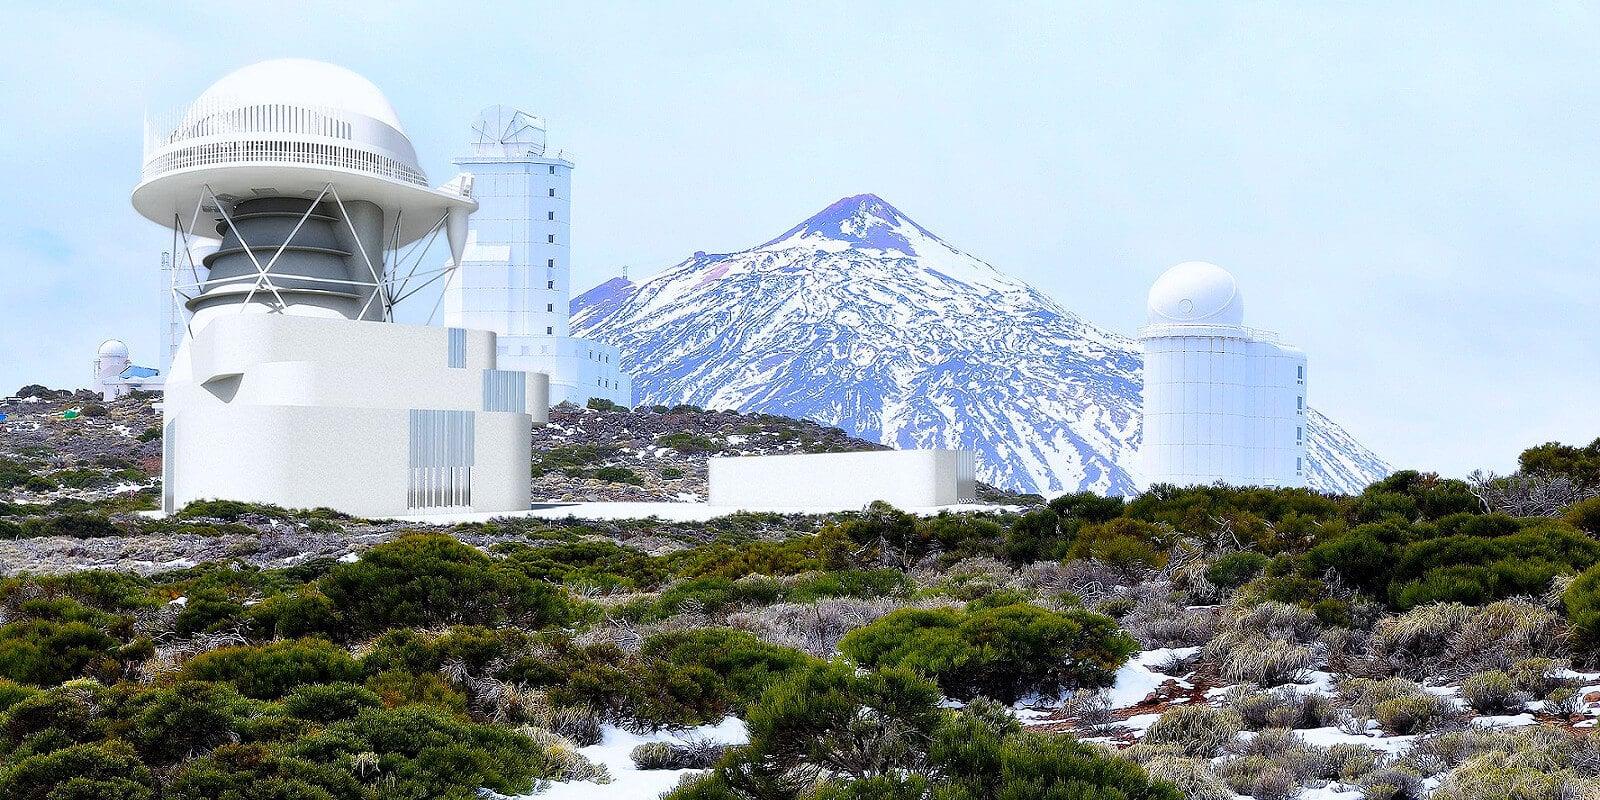 EST_European_Solar_Telescope_Canary_Islands_IDOM_ADA_2_